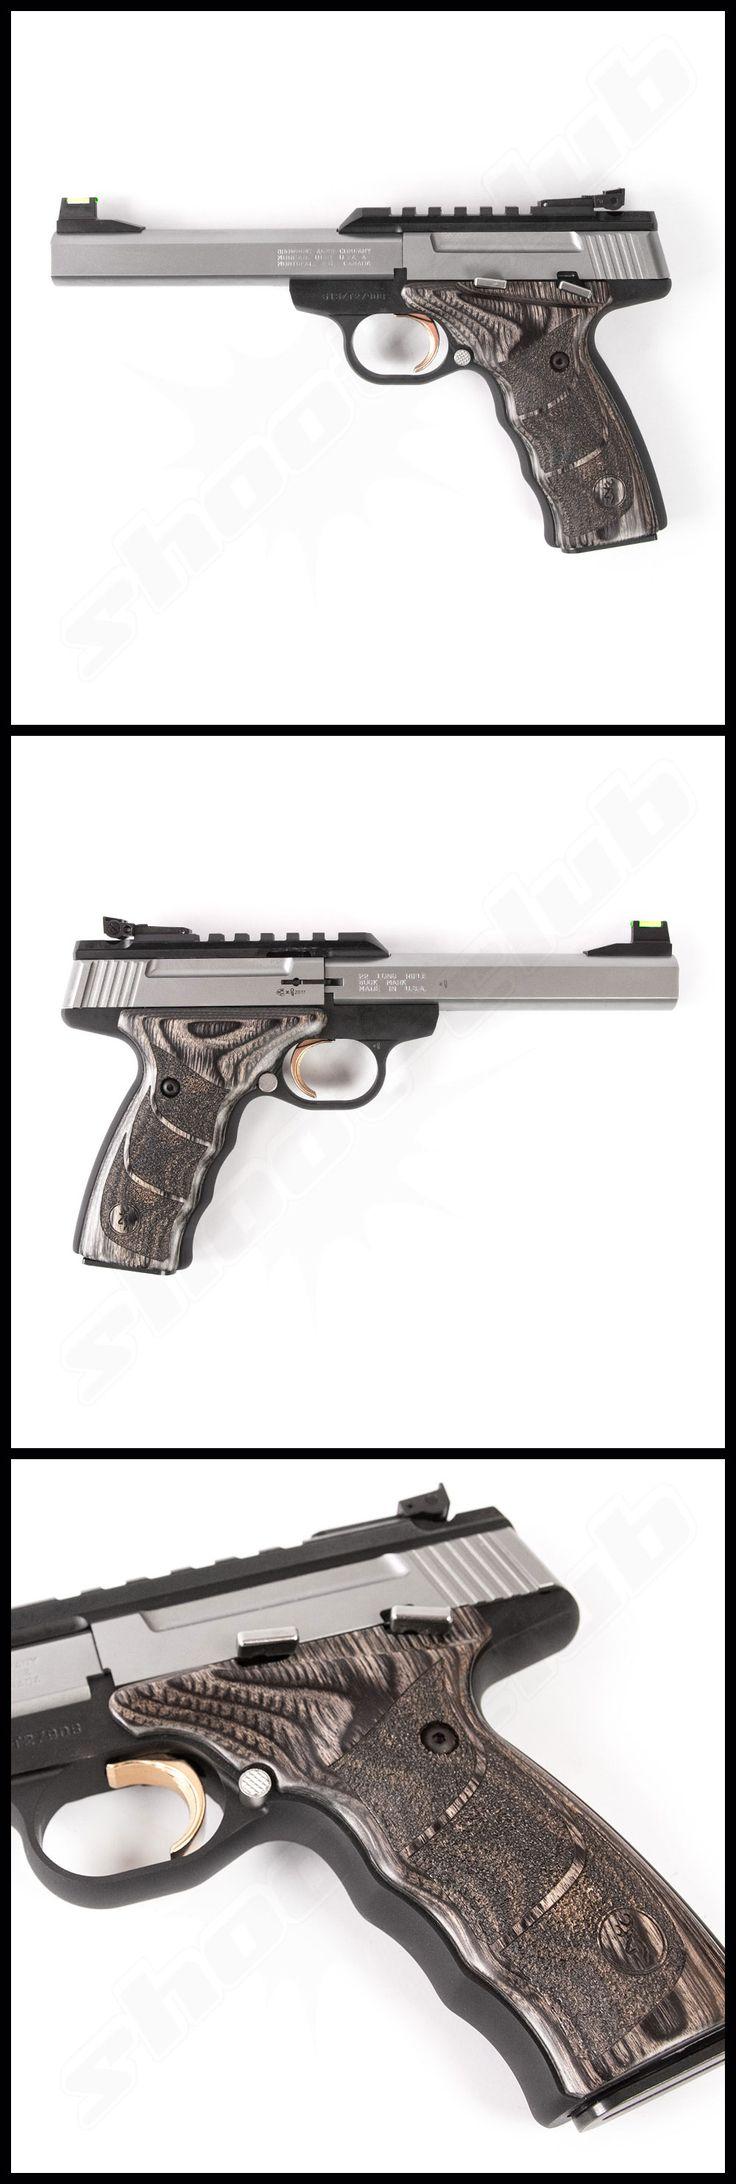 Browning Buck Mark UDX Stainless  Sportpistole im Kaliber .22lr